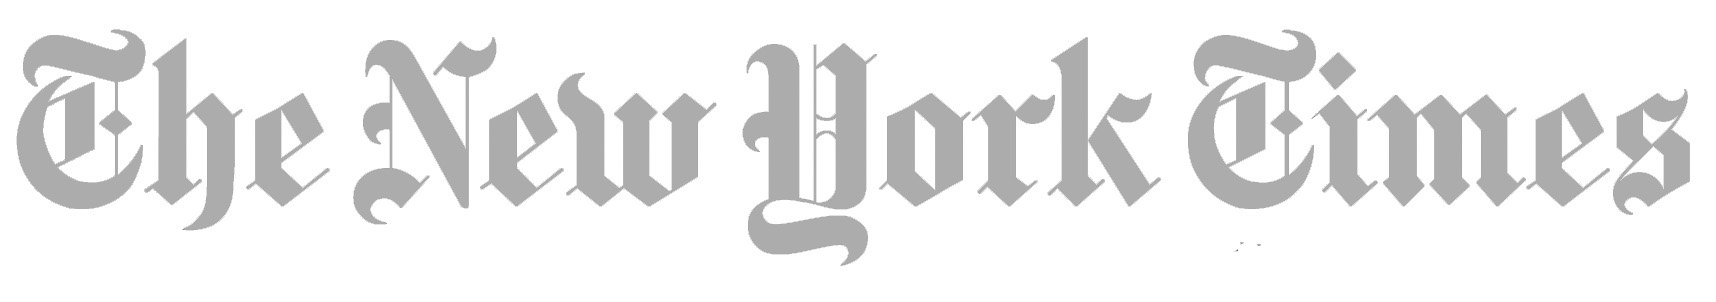 the_new_york_times_logo copy.jpg